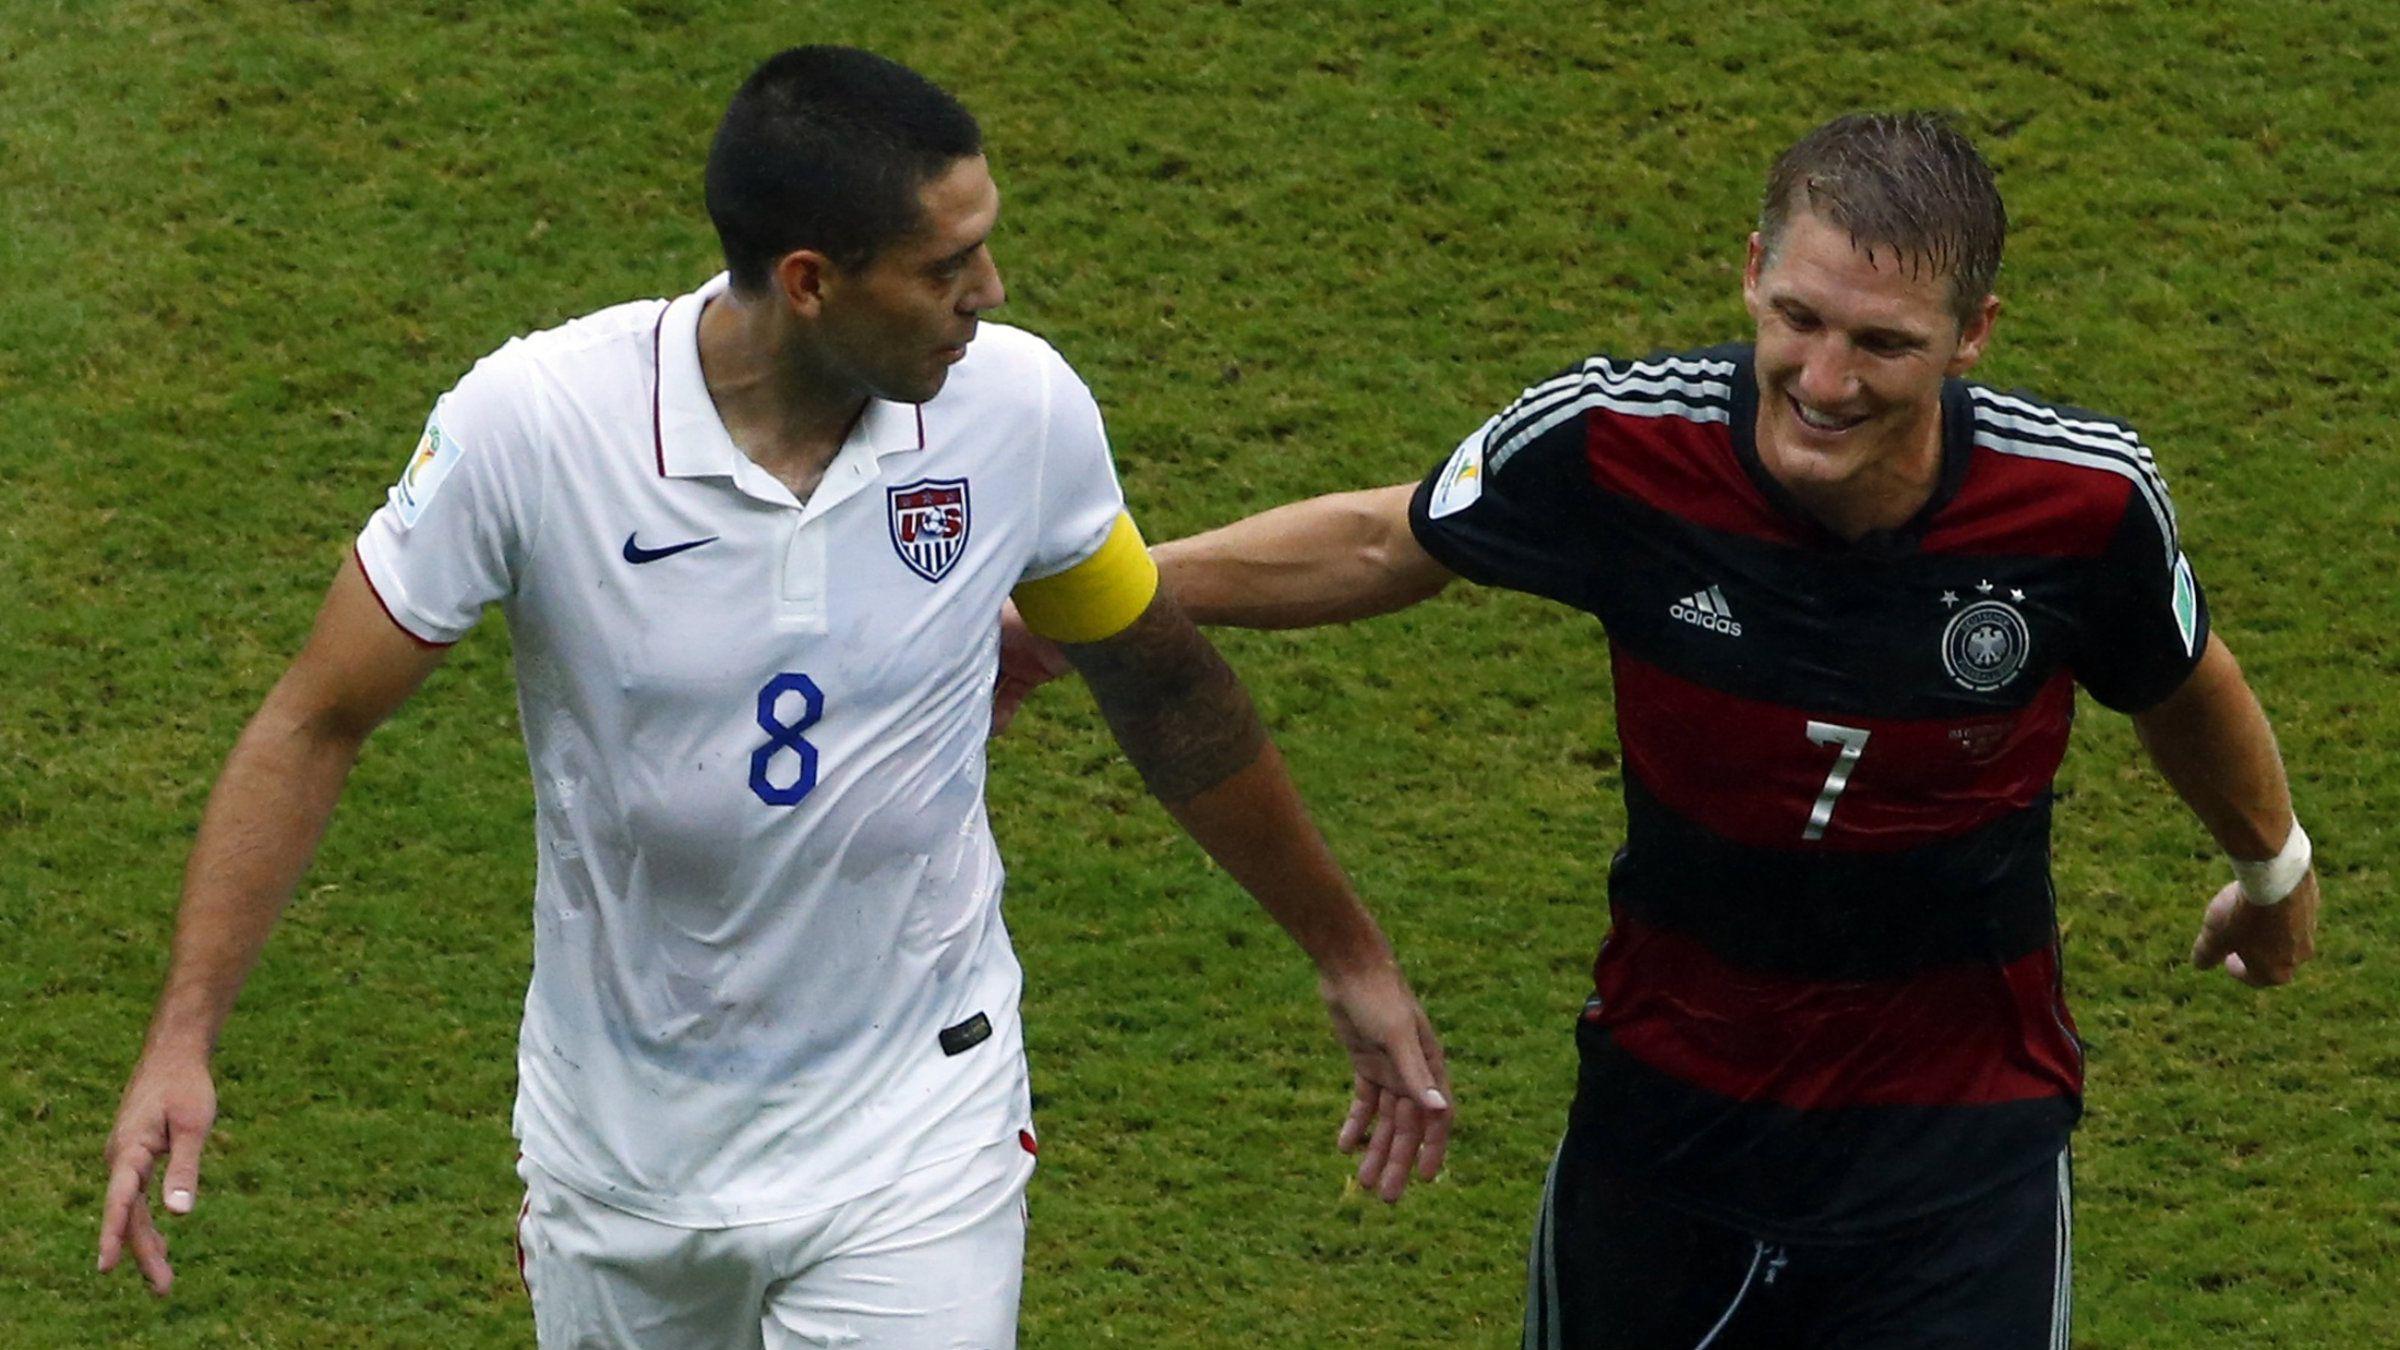 Clint Dempsey of the U.S. and Germany's Bastian Schweinsteiger talk